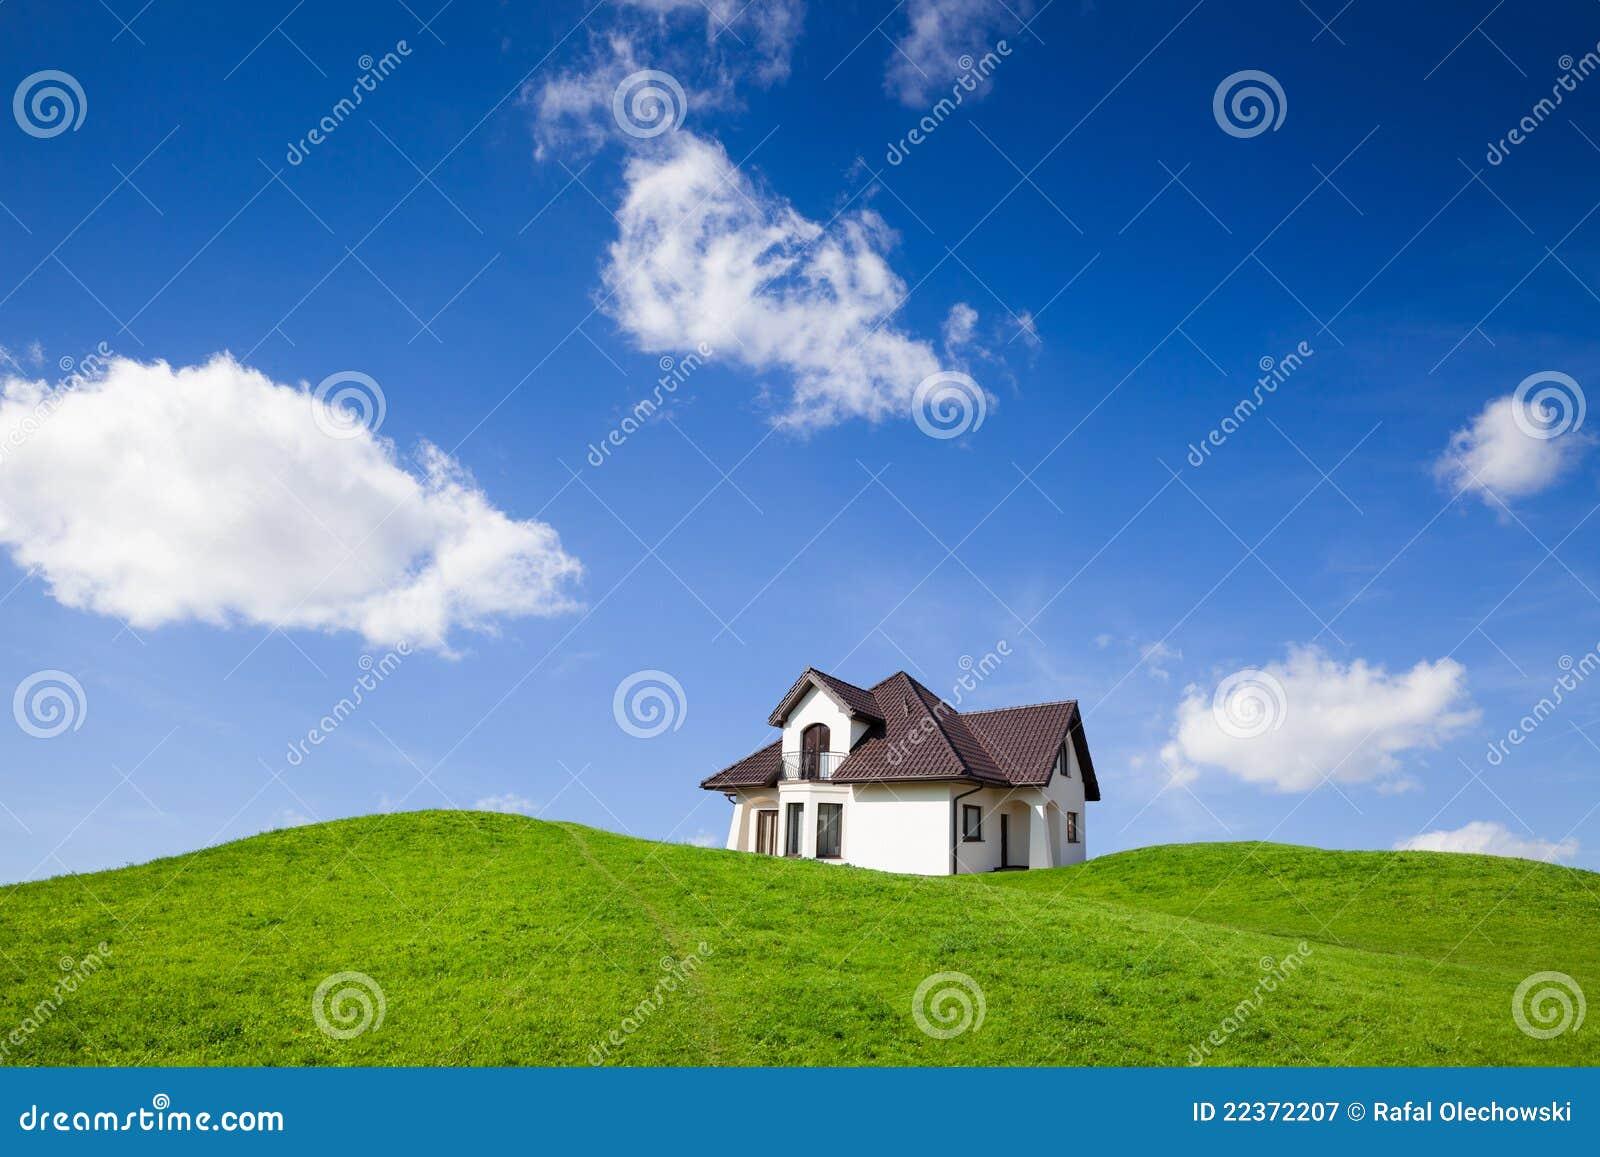 Nueva casa en campo verde fotograf a de archivo libre de for Agrandissement maison zone verte